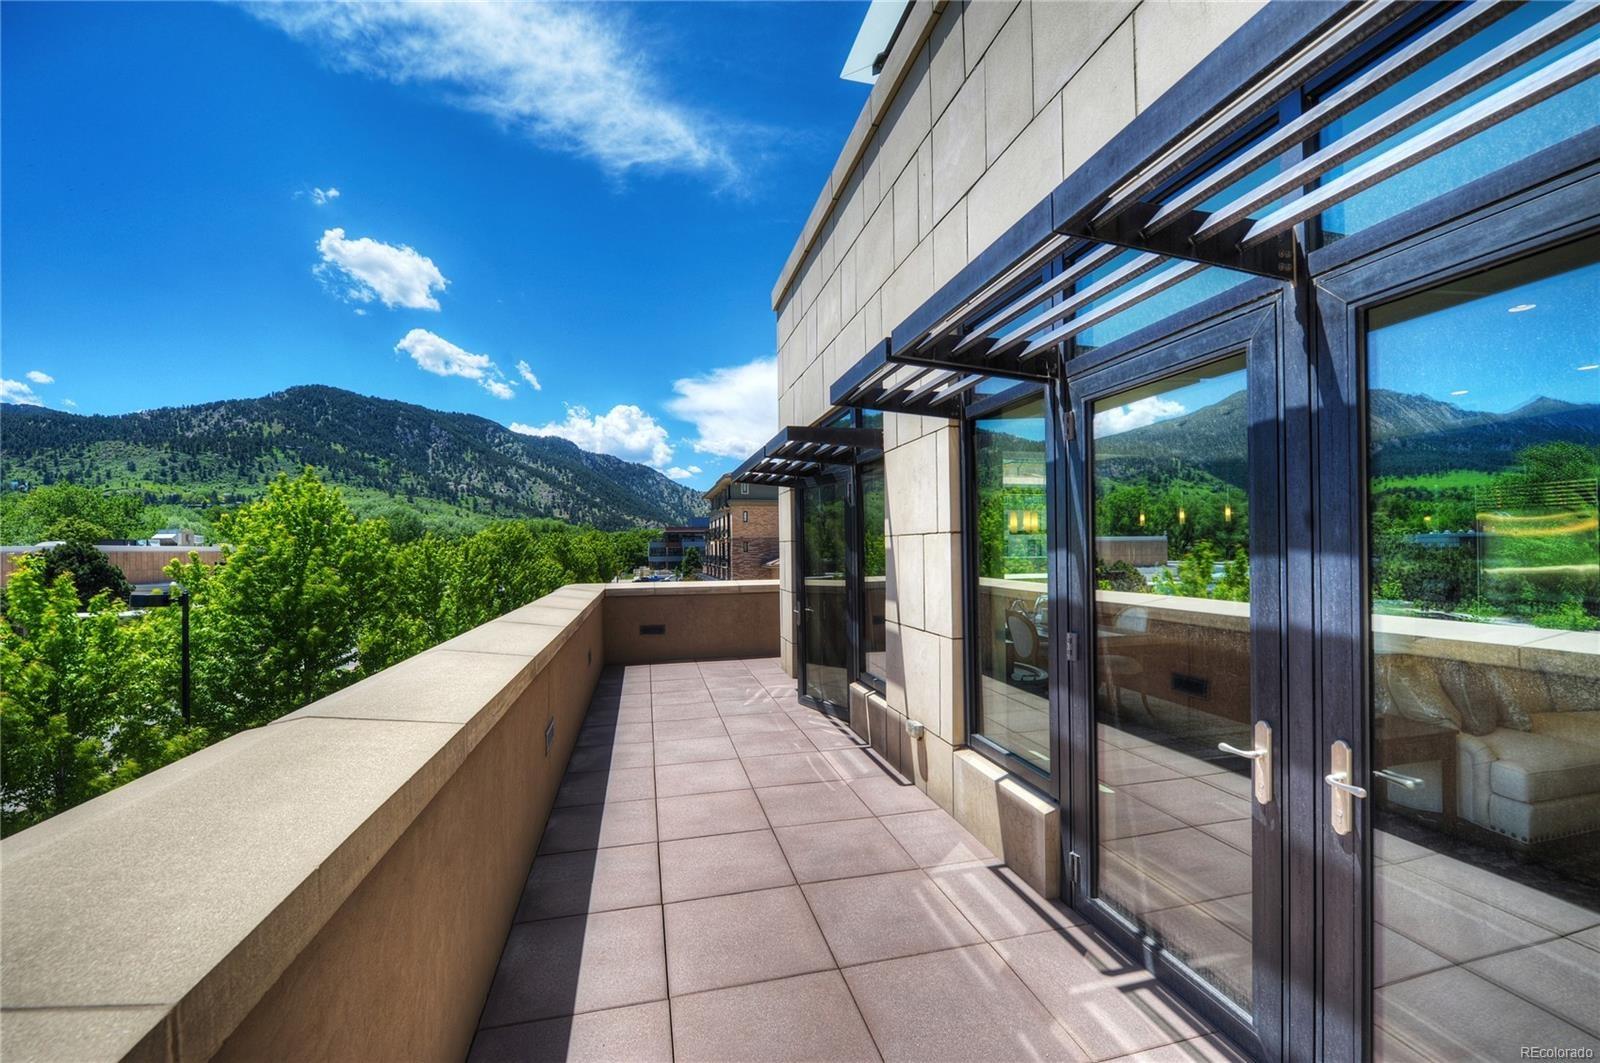 MLS# 8081755 - 1 - 1077 Canyon Boulevard #302, Boulder, CO 80302